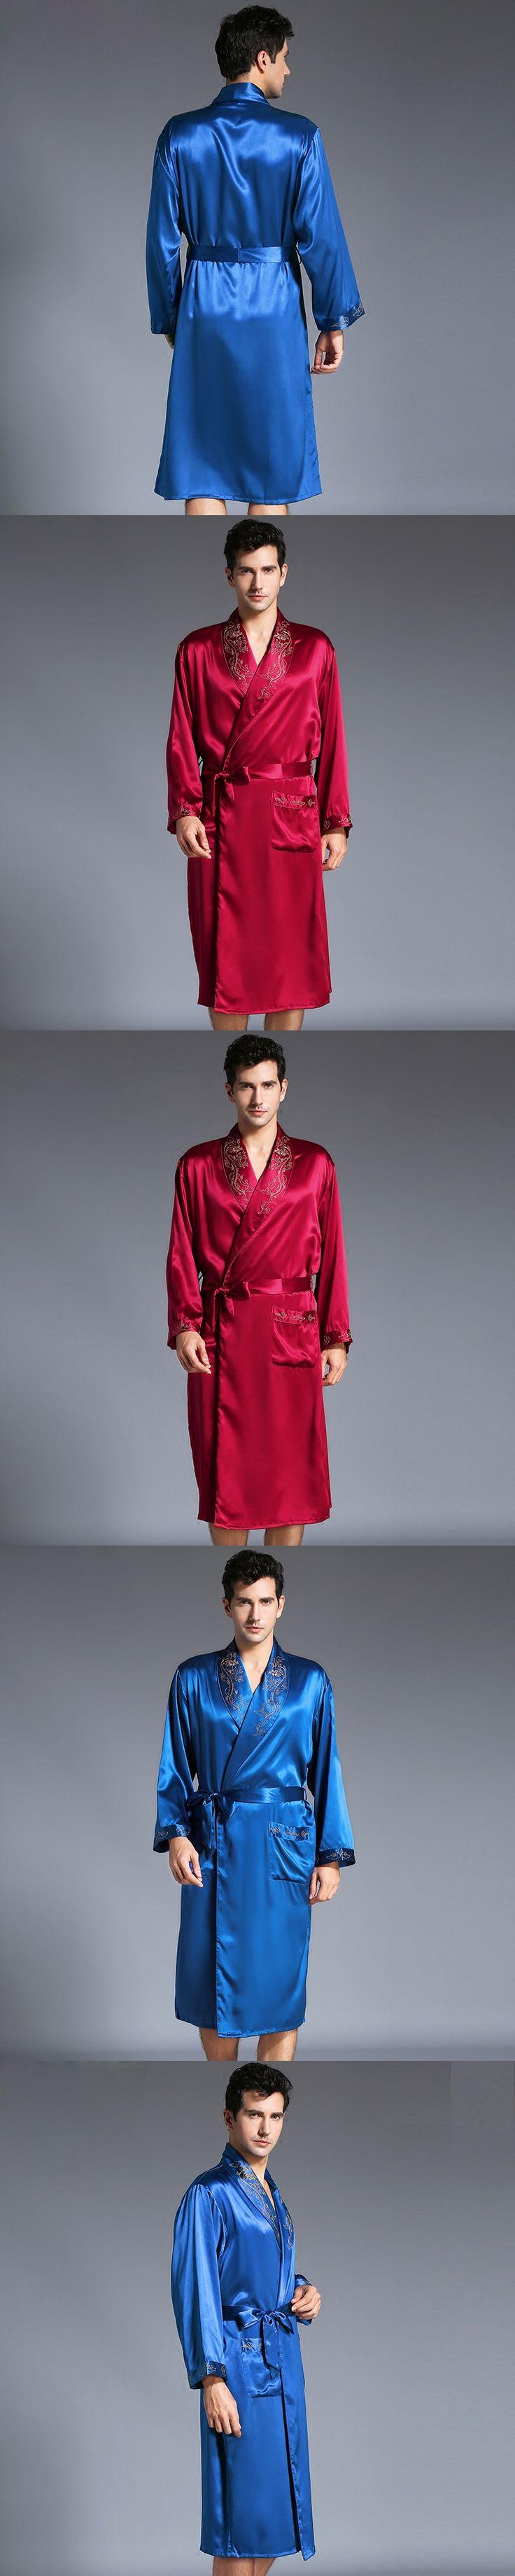 New Male Robe Autumn Men Long-Sleeve Kimono Sleepwear 22 Momme Heavy Silk Bathrobe Men Sleepwear Men's Silk Robe Free Shipping